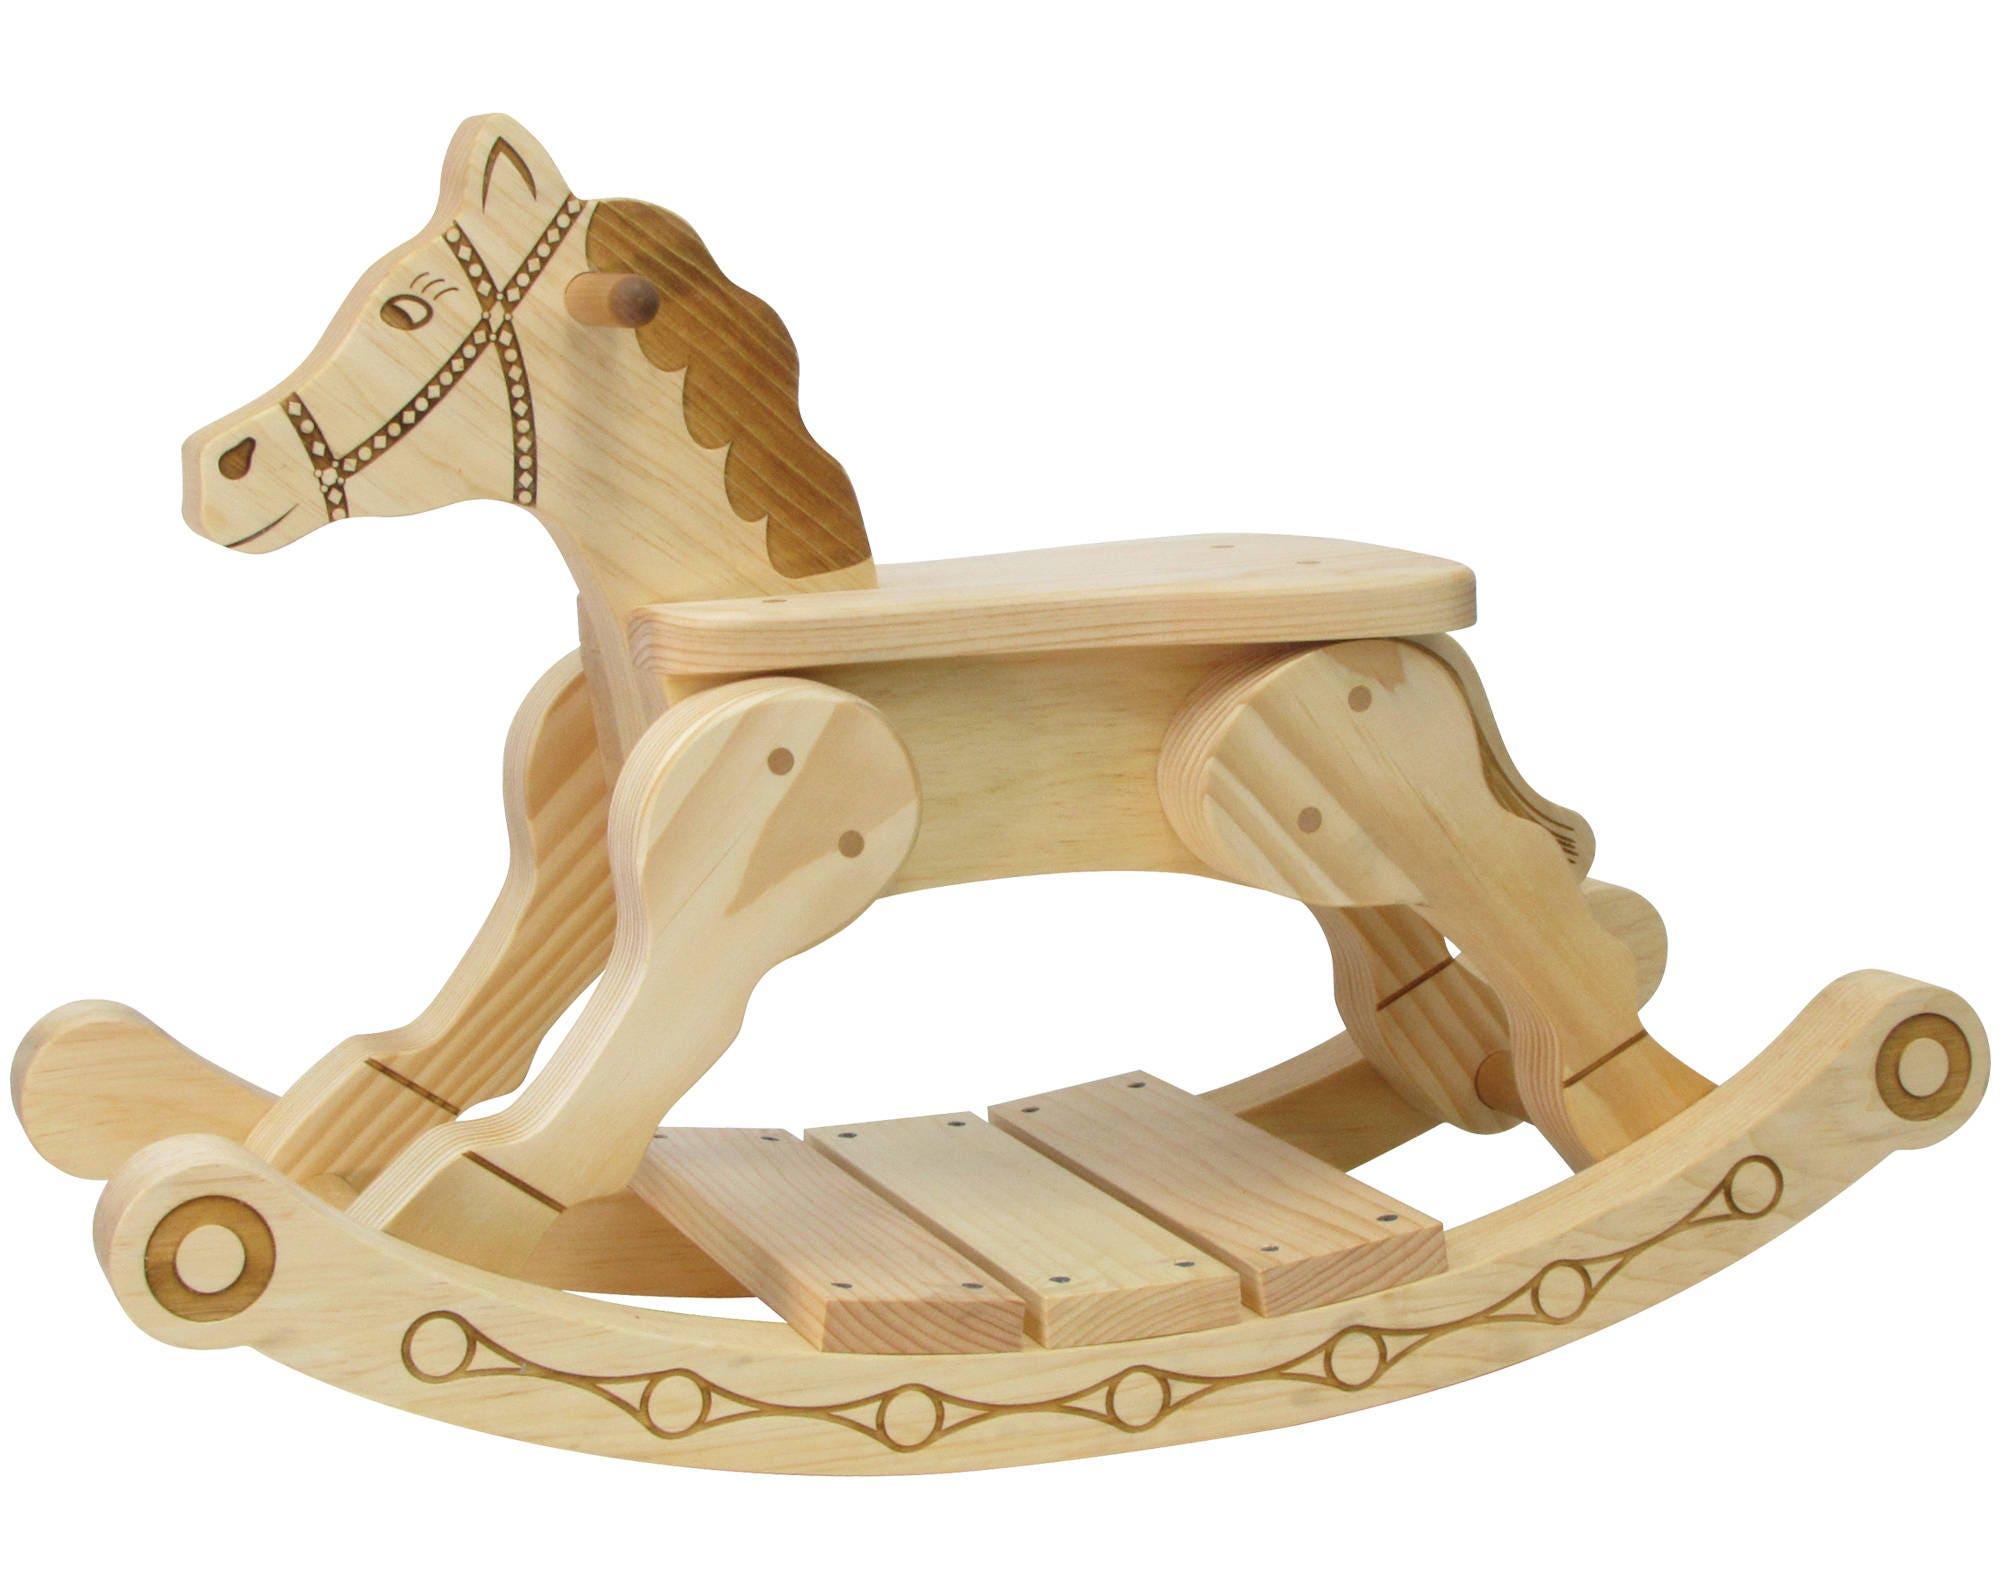 Rocker-feller Rocking Horse with Optional Name Plate